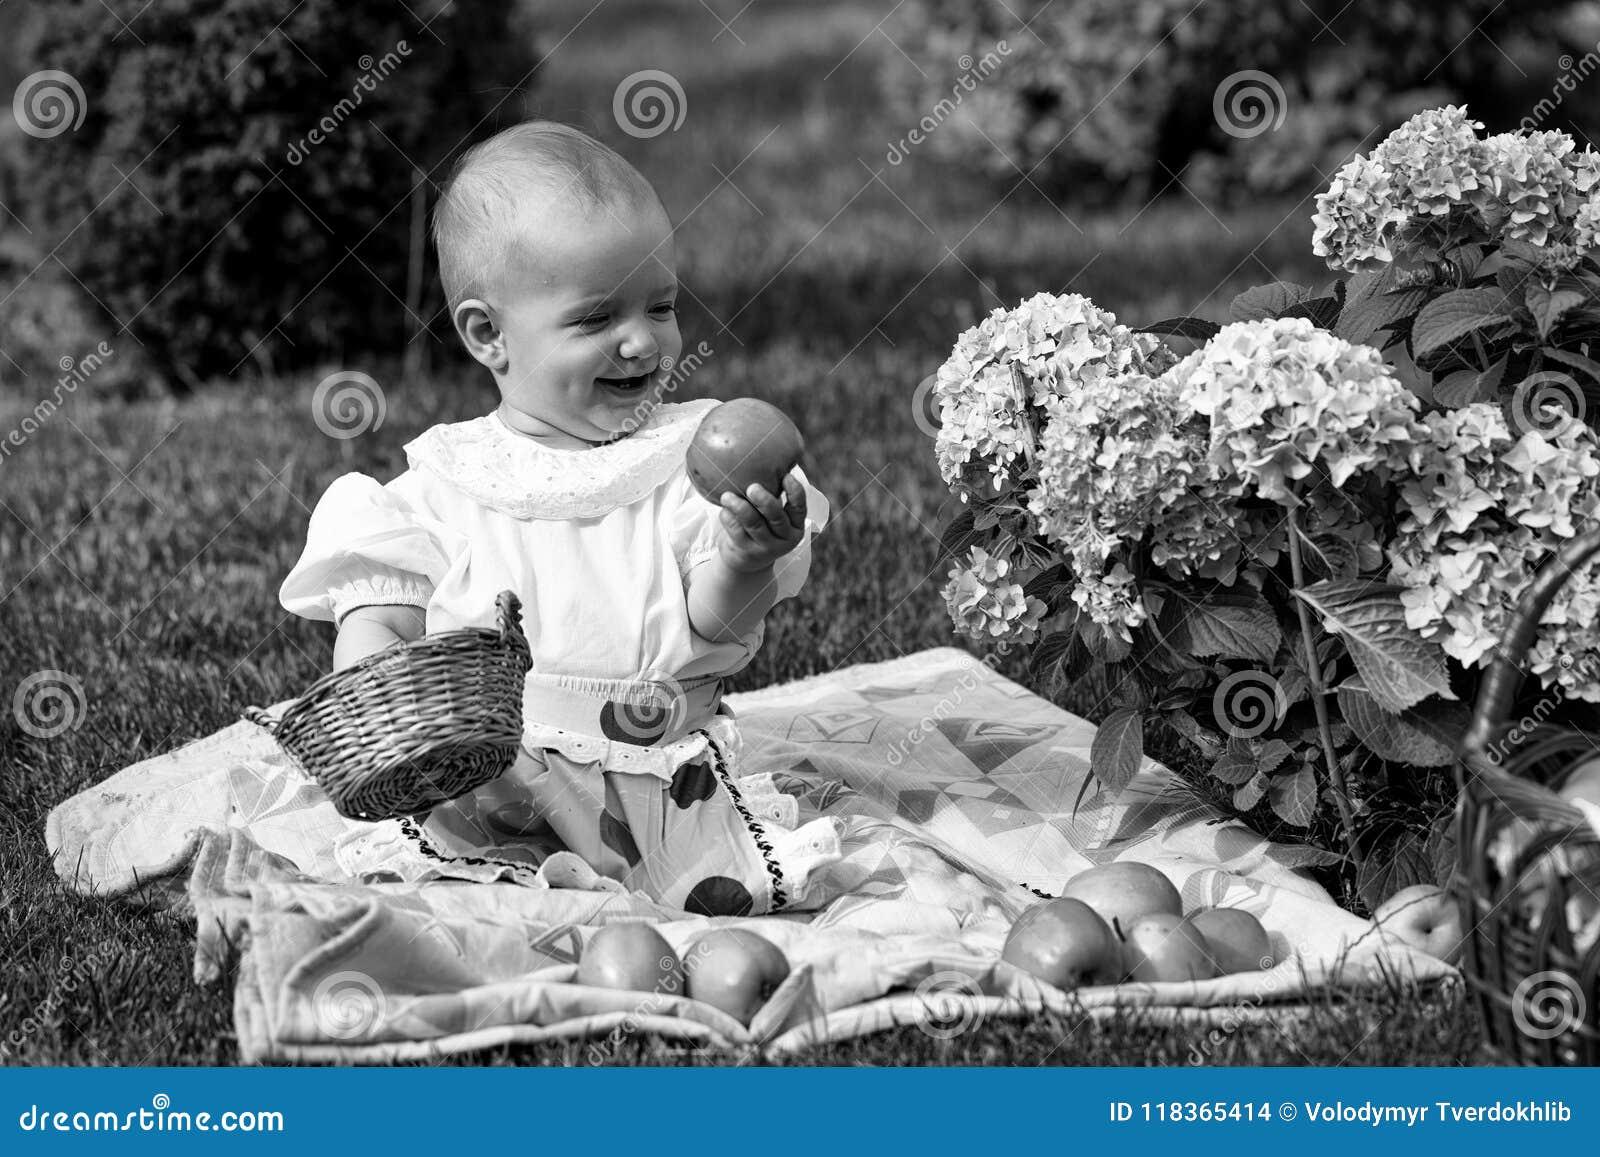 6686c85f2185 Happy Kid Having Fun. Baby Girl On Picnic Stock Photo - Image of ...